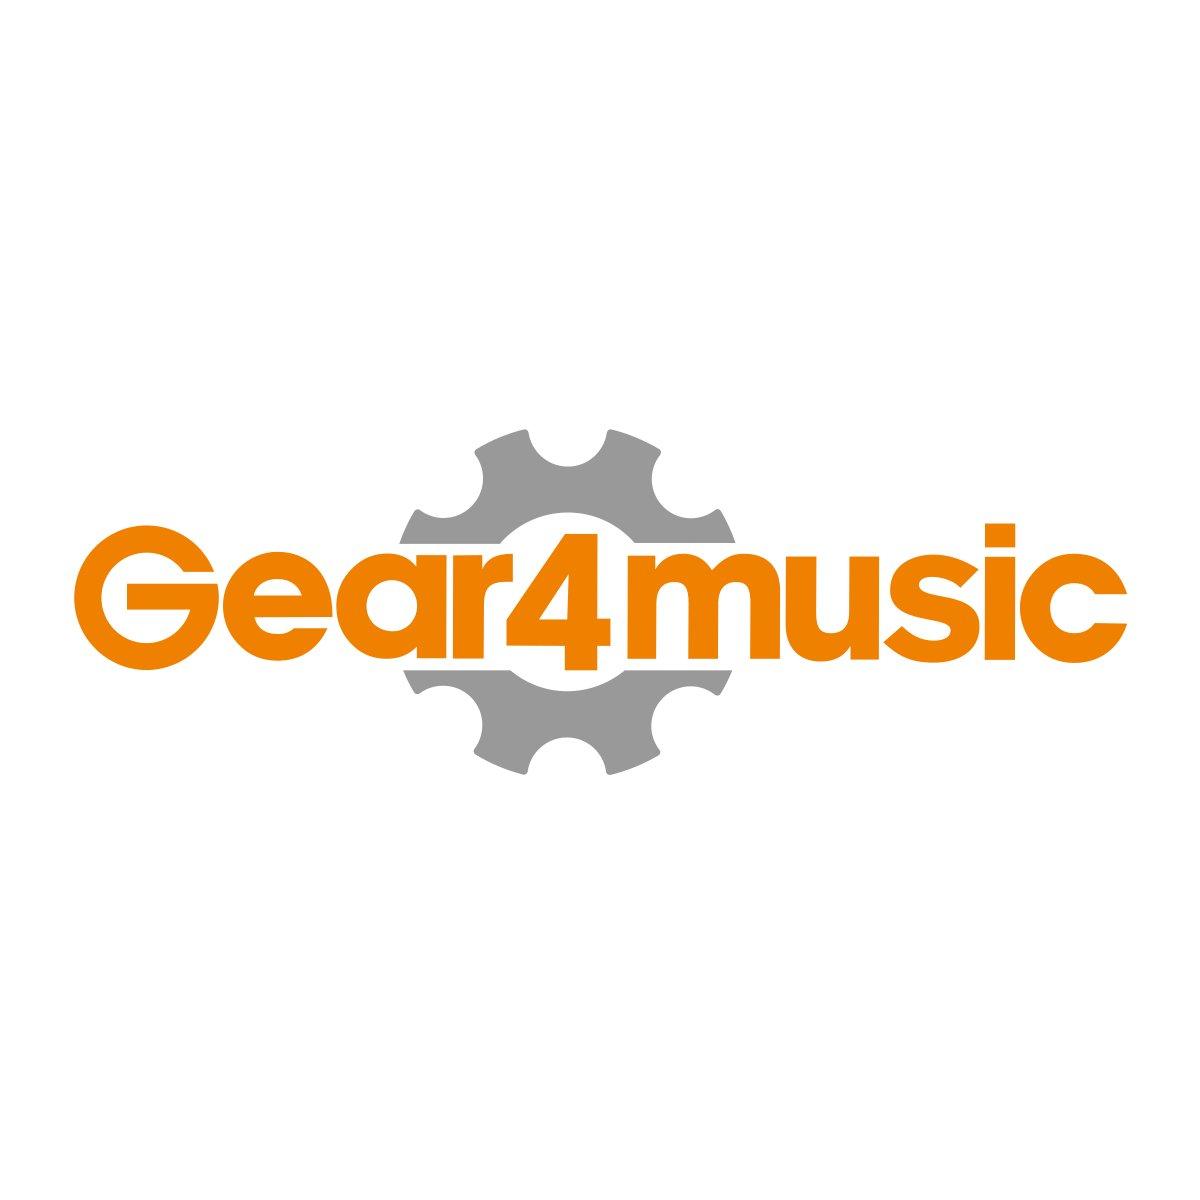 Deluxe mandolína tašku s ušima o Gear4music